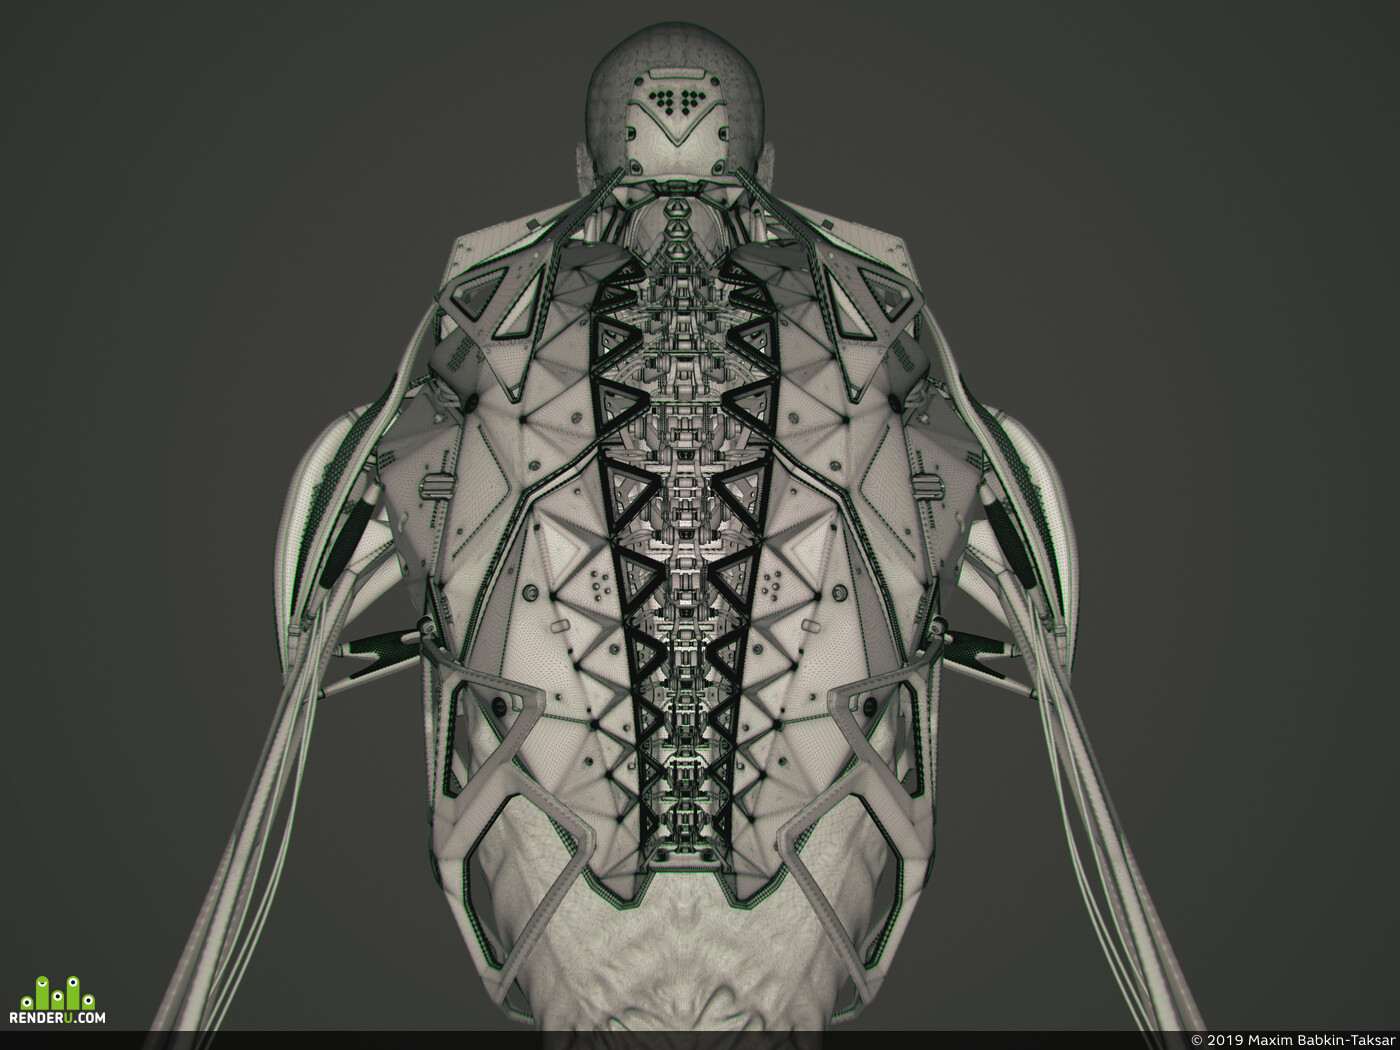 ConceptArt, sculpting, digital3d, character3d, characterdesign, ZBrush, mecha, sci-fi, KeyShot